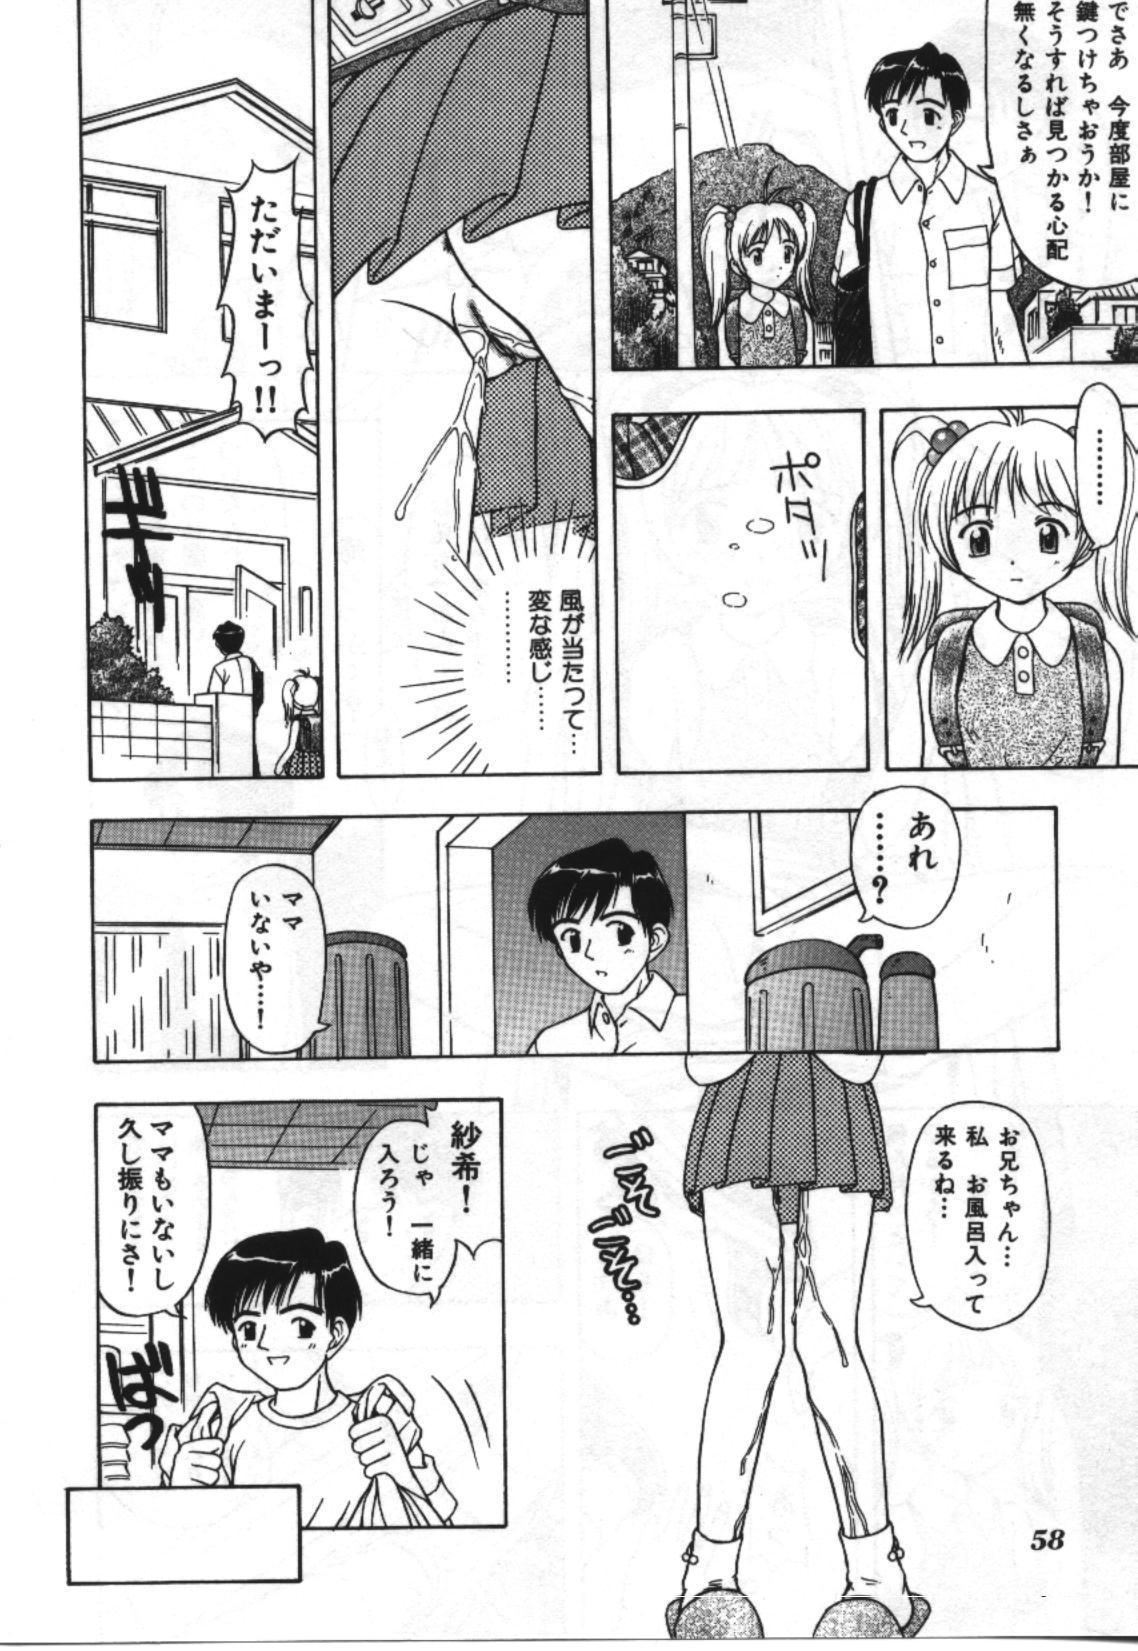 Imouto Koishi 2 57